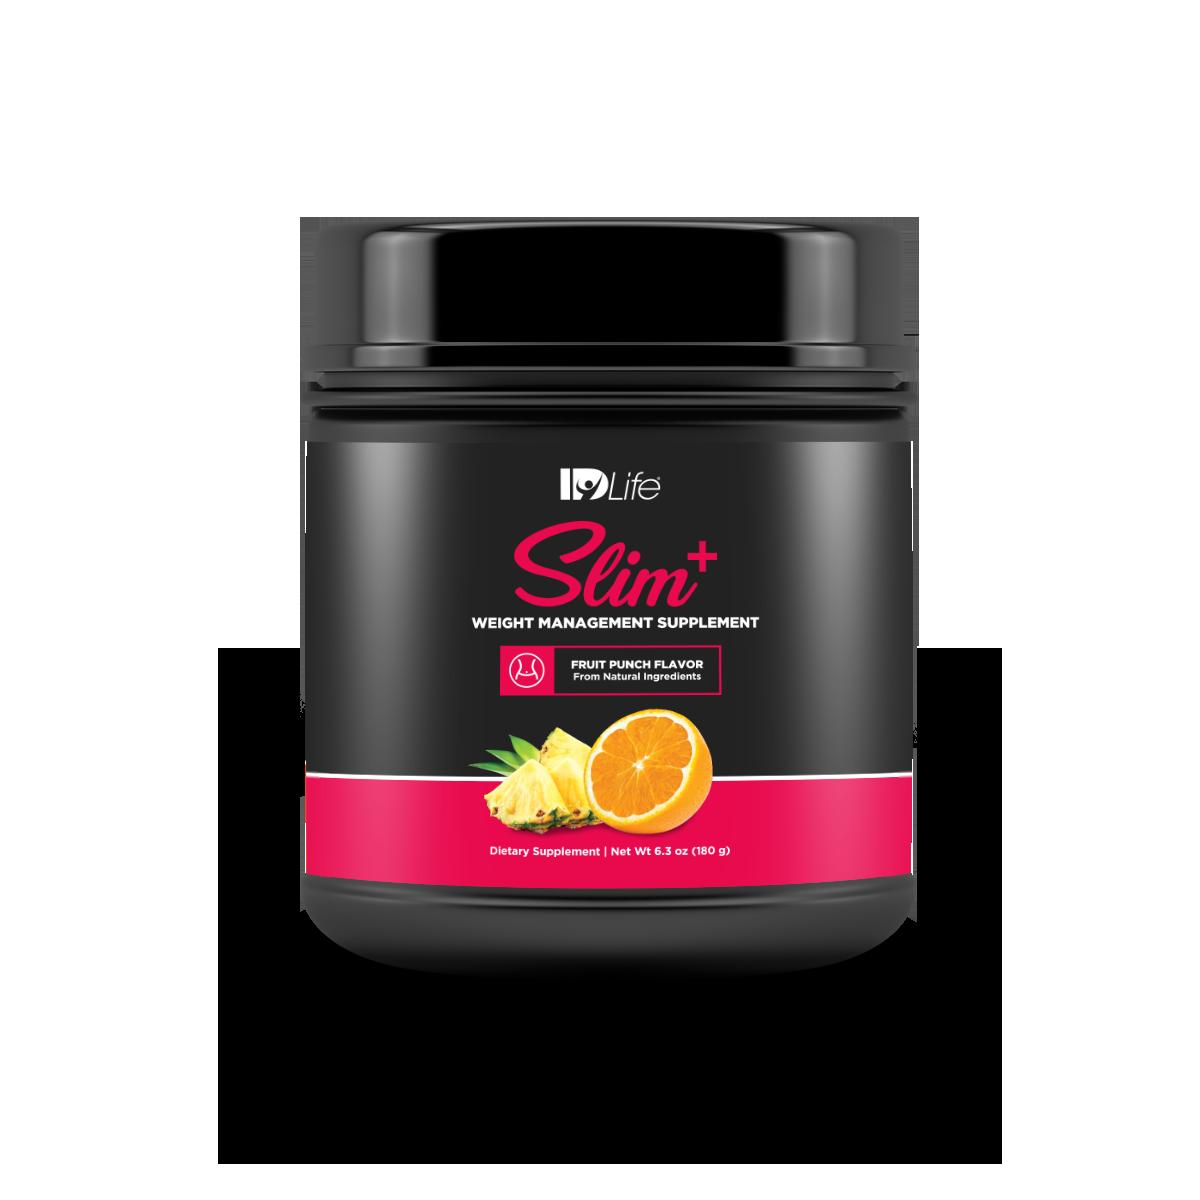 IDLife Slim+ weight loss tool. #loseweight #nongmo #glutenfree #nosugar #guthealth #energy #focus #appetitecontrol #mood